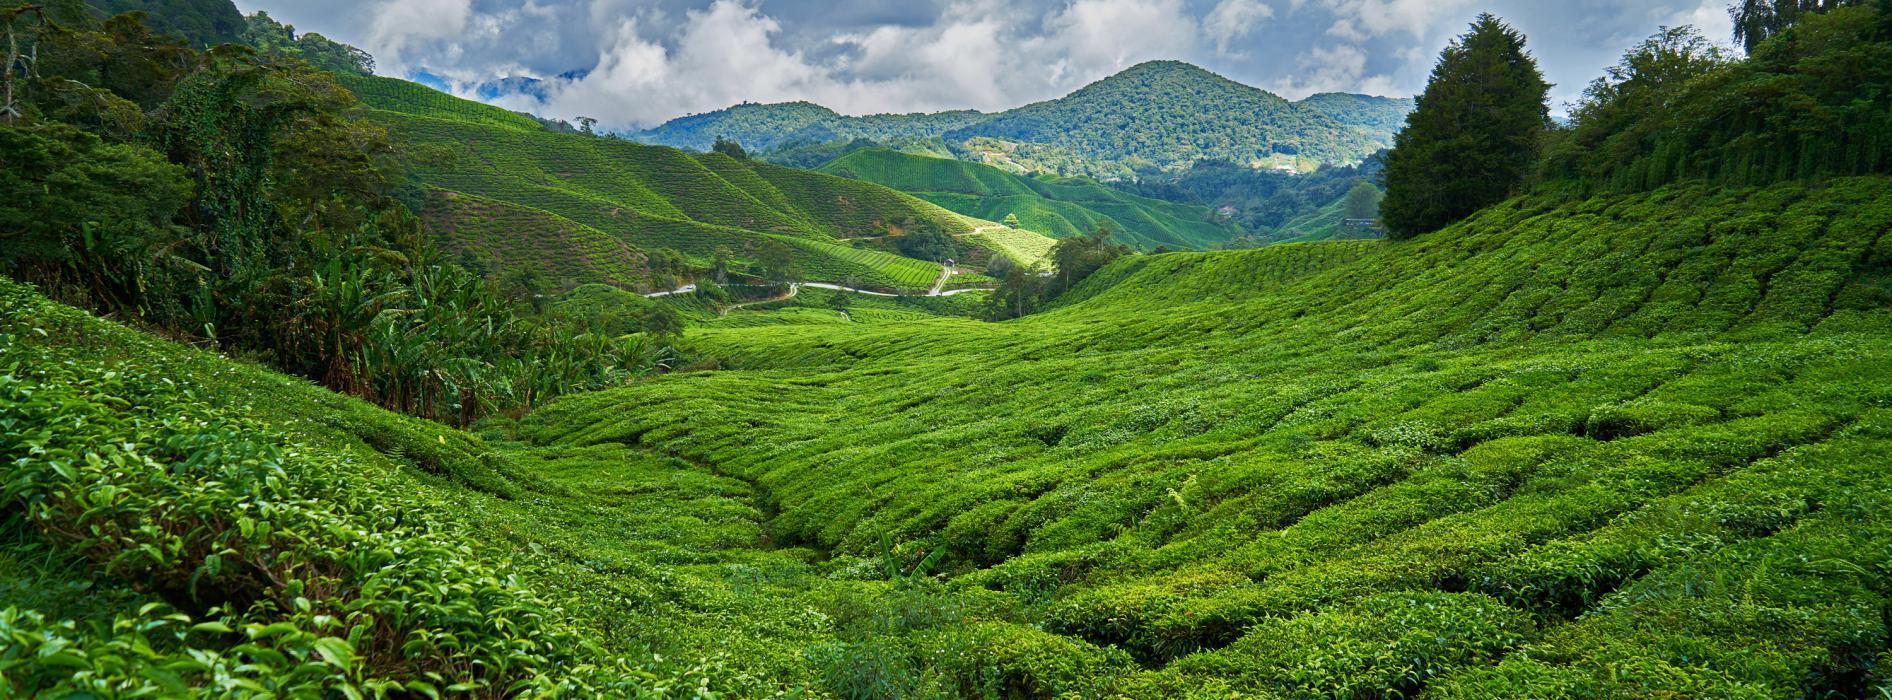 tea field1.jpg